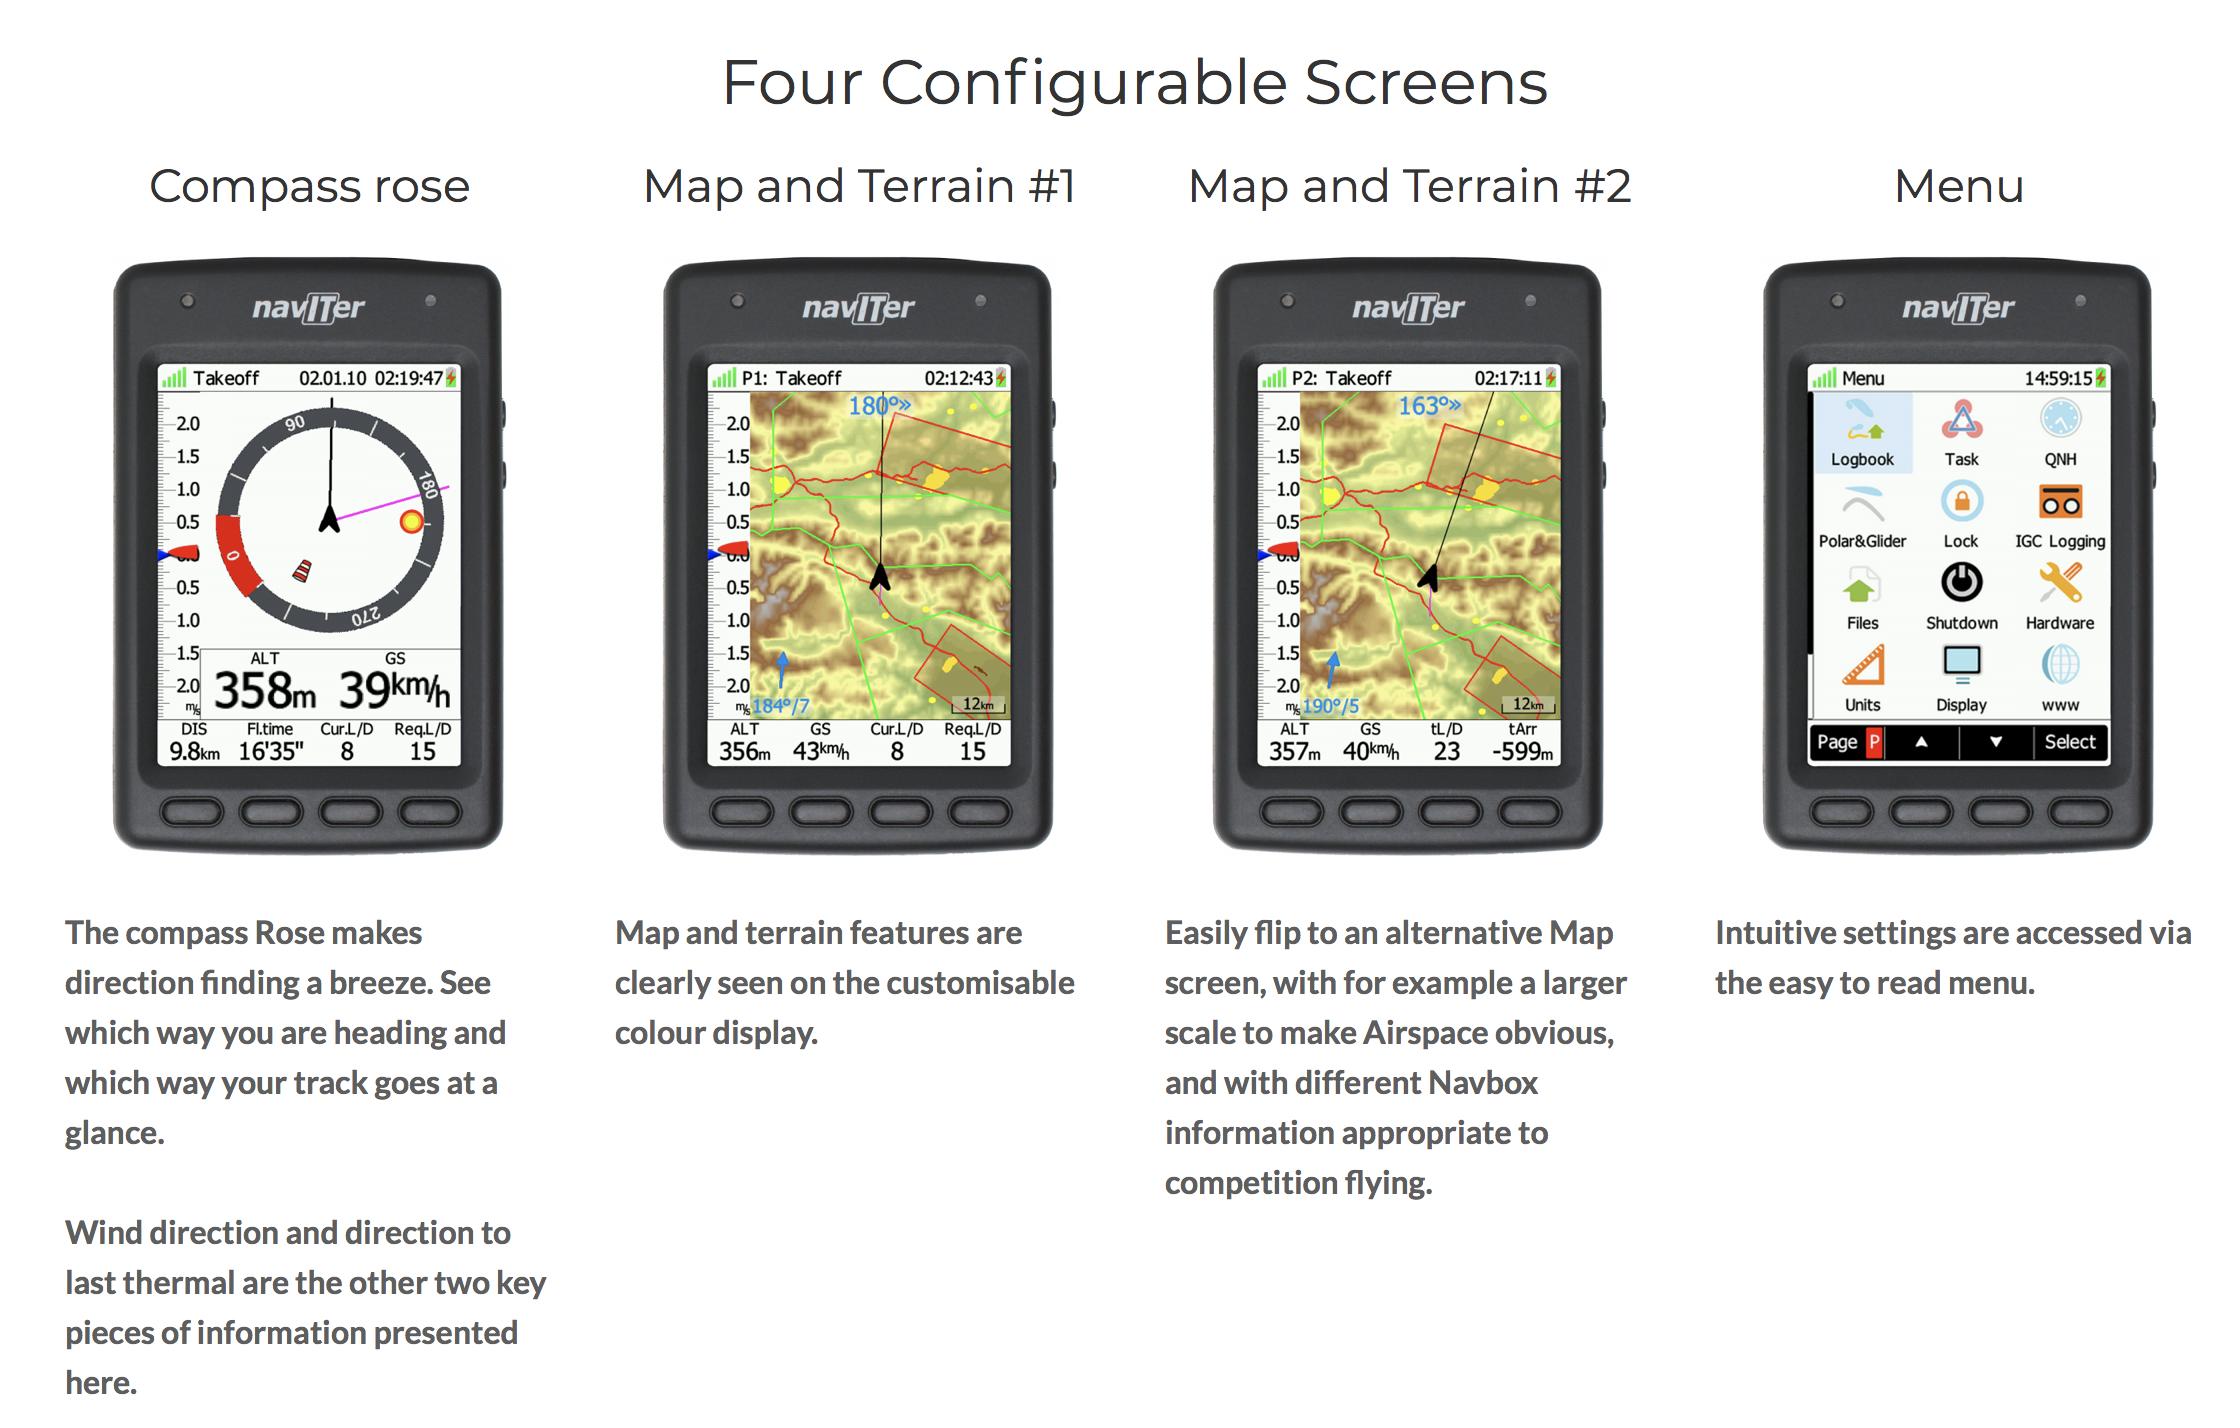 Naviter Hyper - Four Configurable Screens